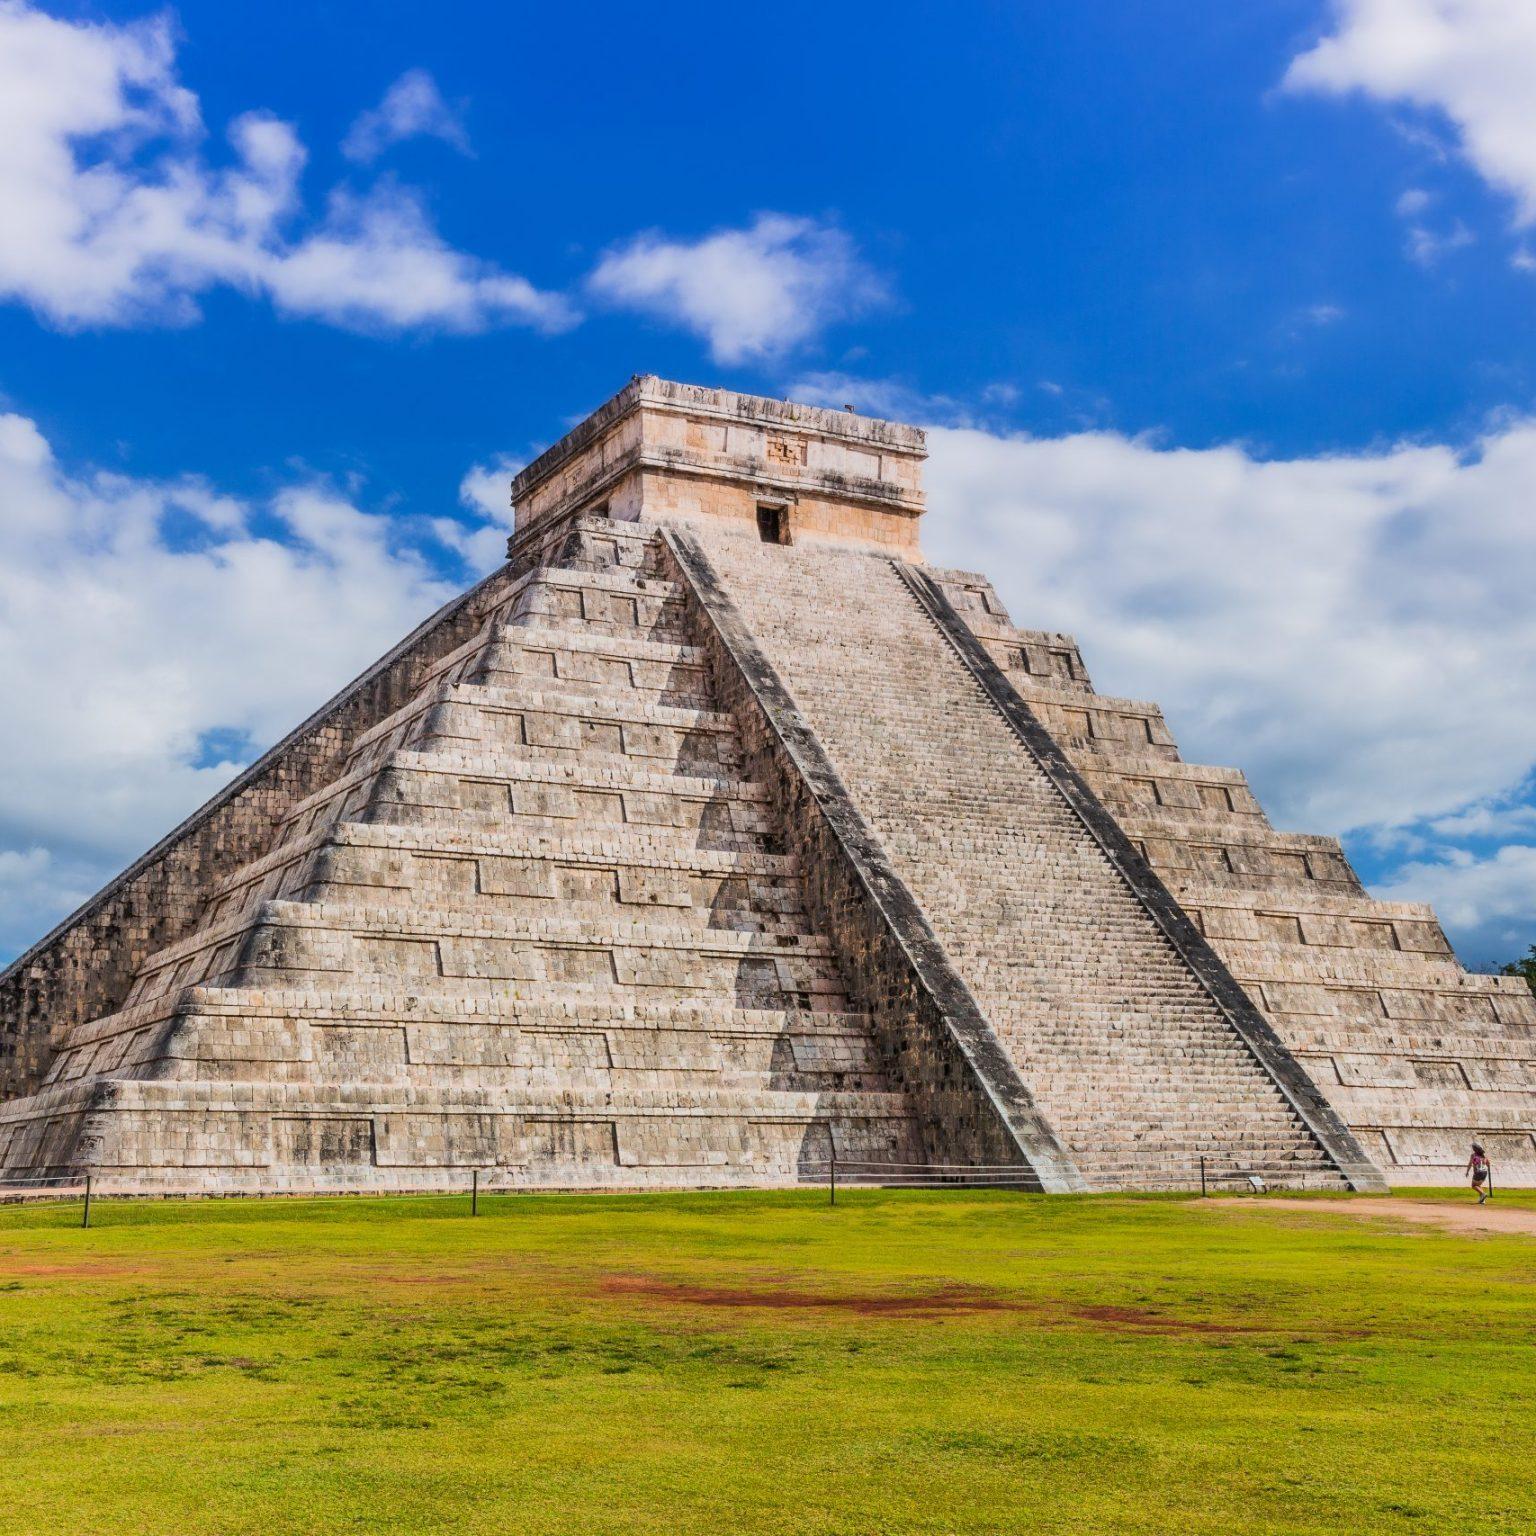 Zona arqueológica maya Cancún